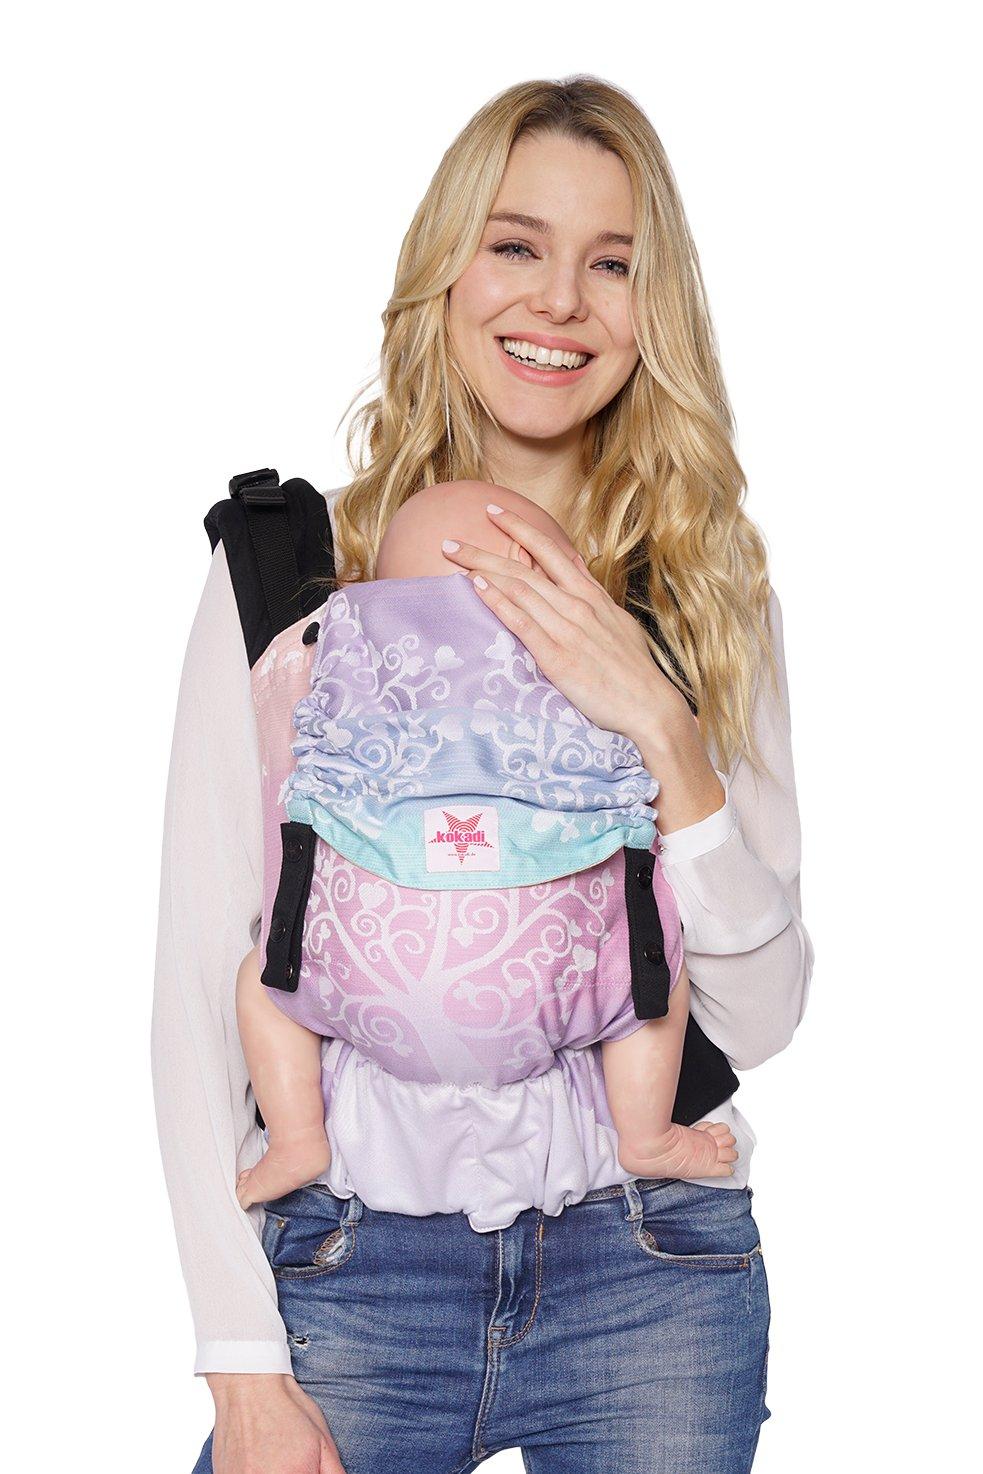 KOKADI® Babytrage Flip - Marie im Wunderland (Toddler) 203052